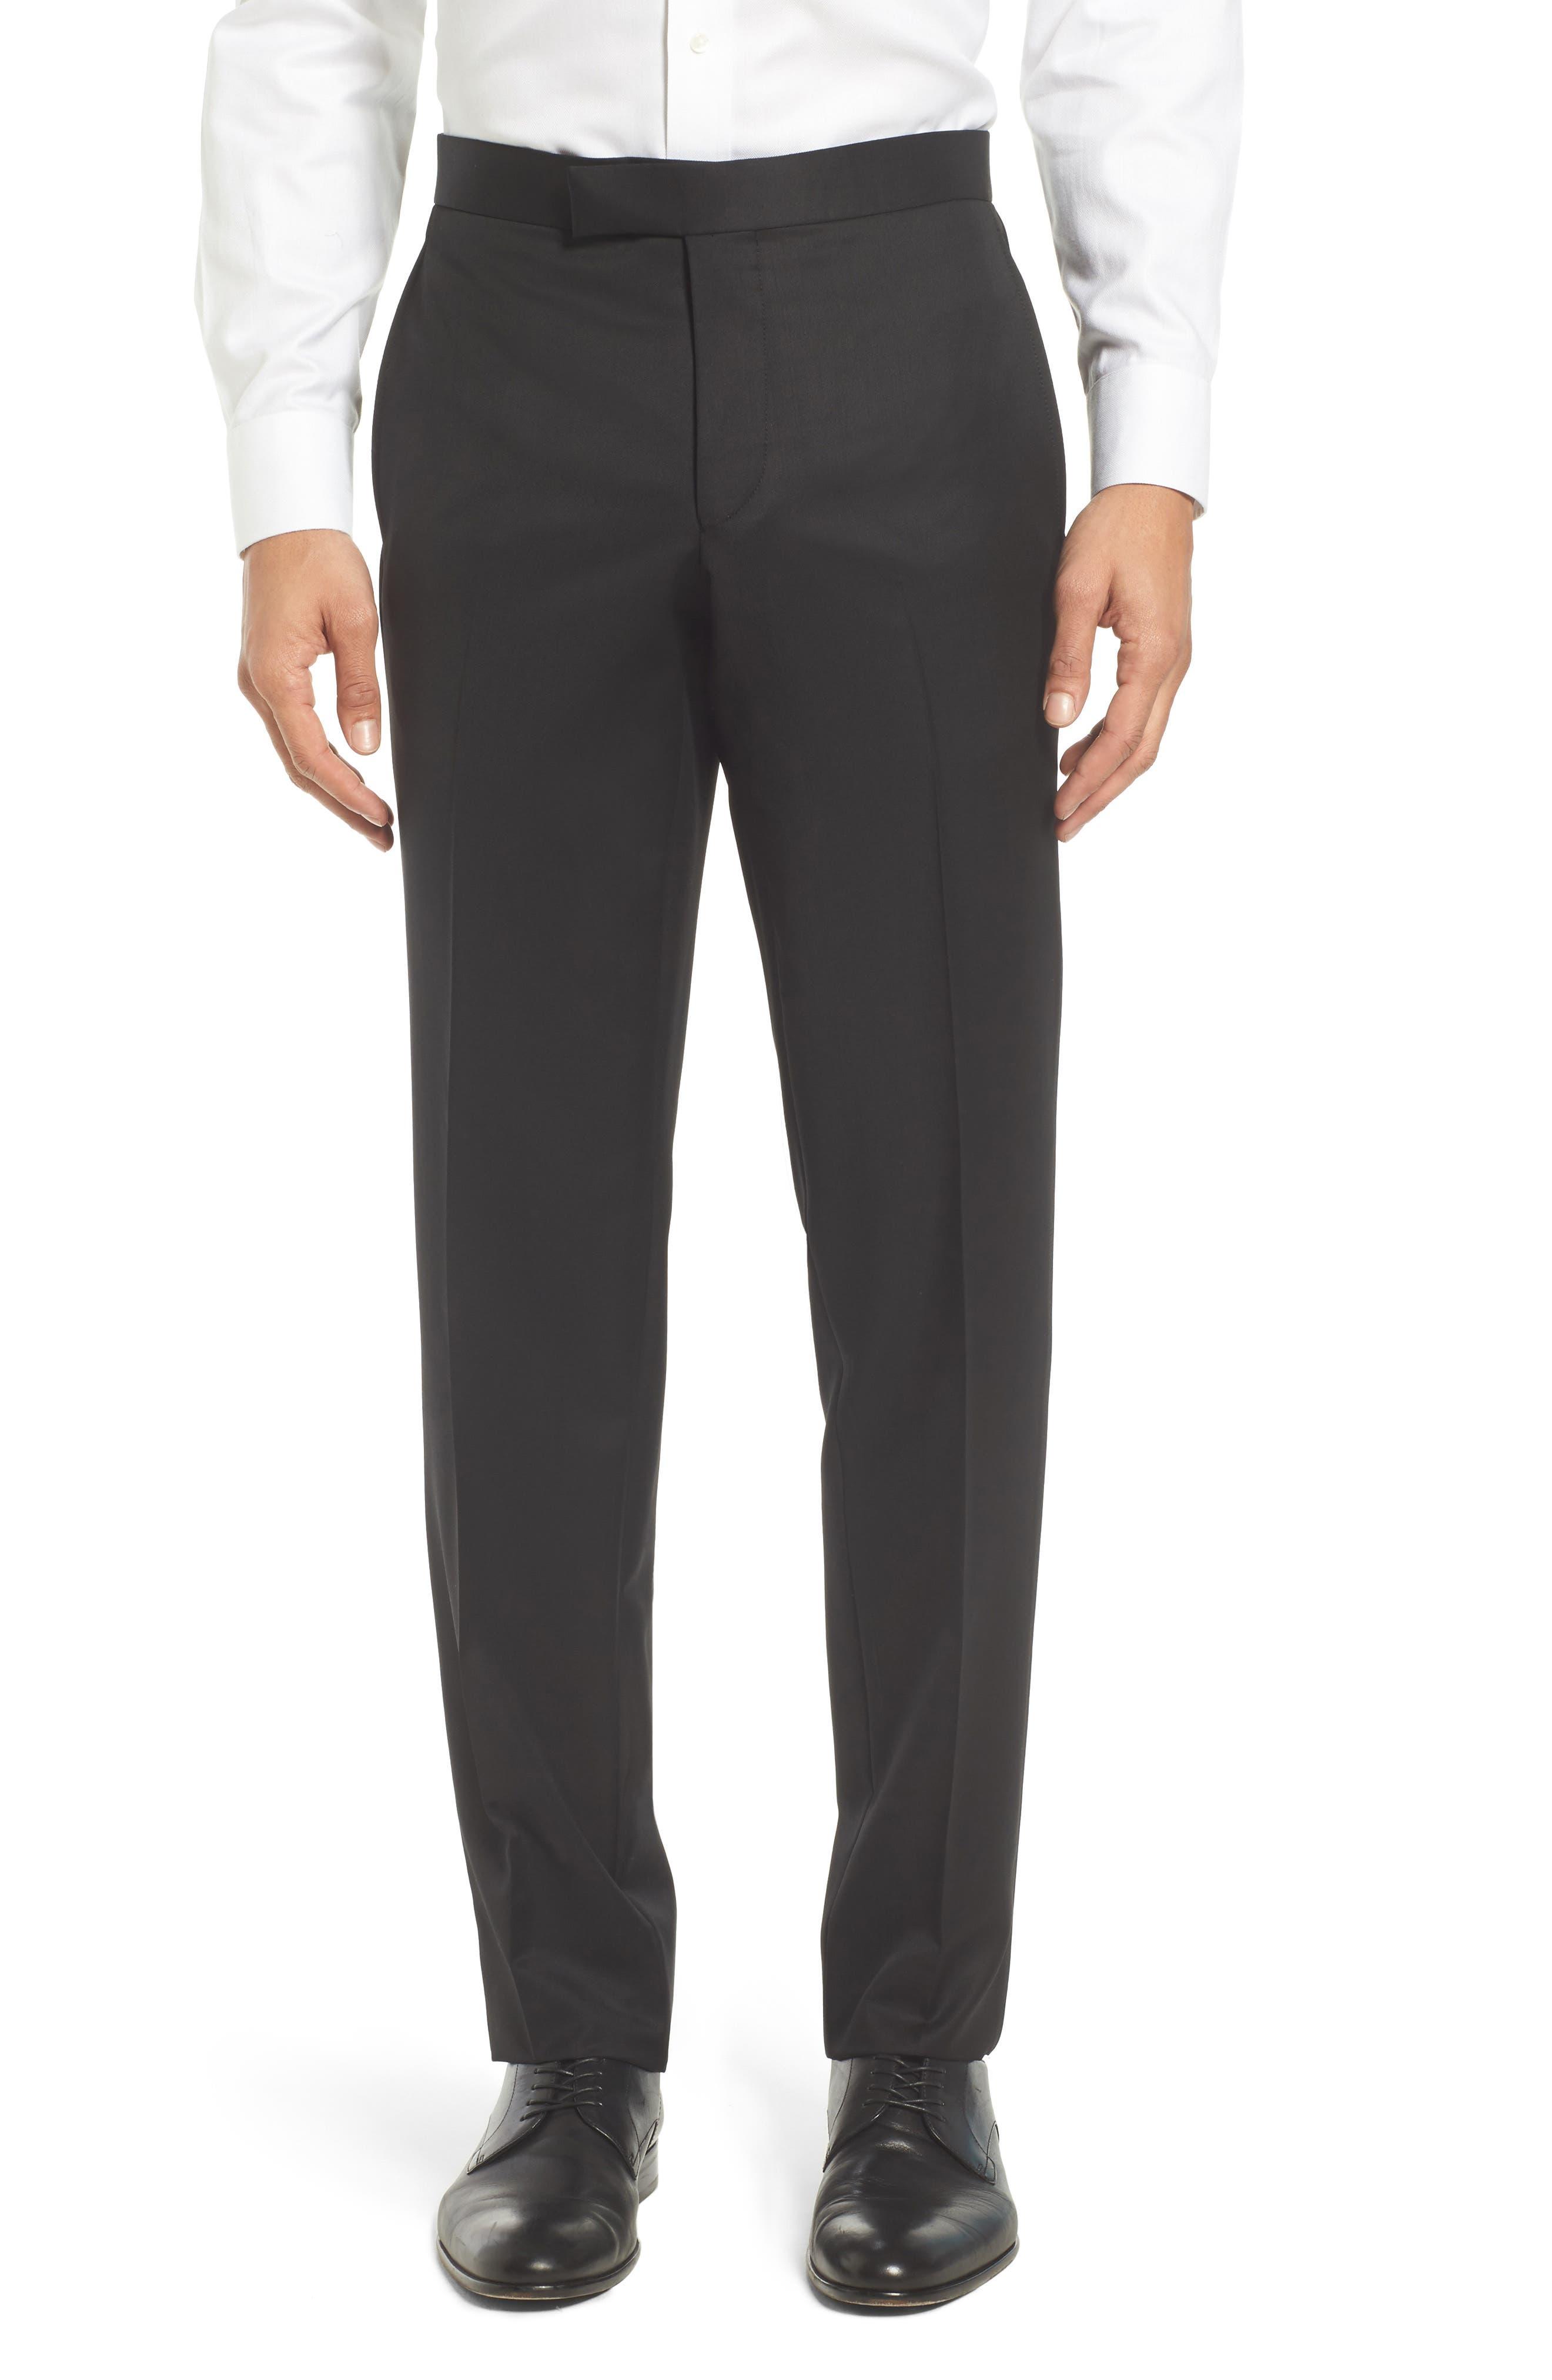 TED BAKER LONDON, Josh Flat Front Wool & Mohair Tuxedo Pants, Main thumbnail 1, color, BLACK